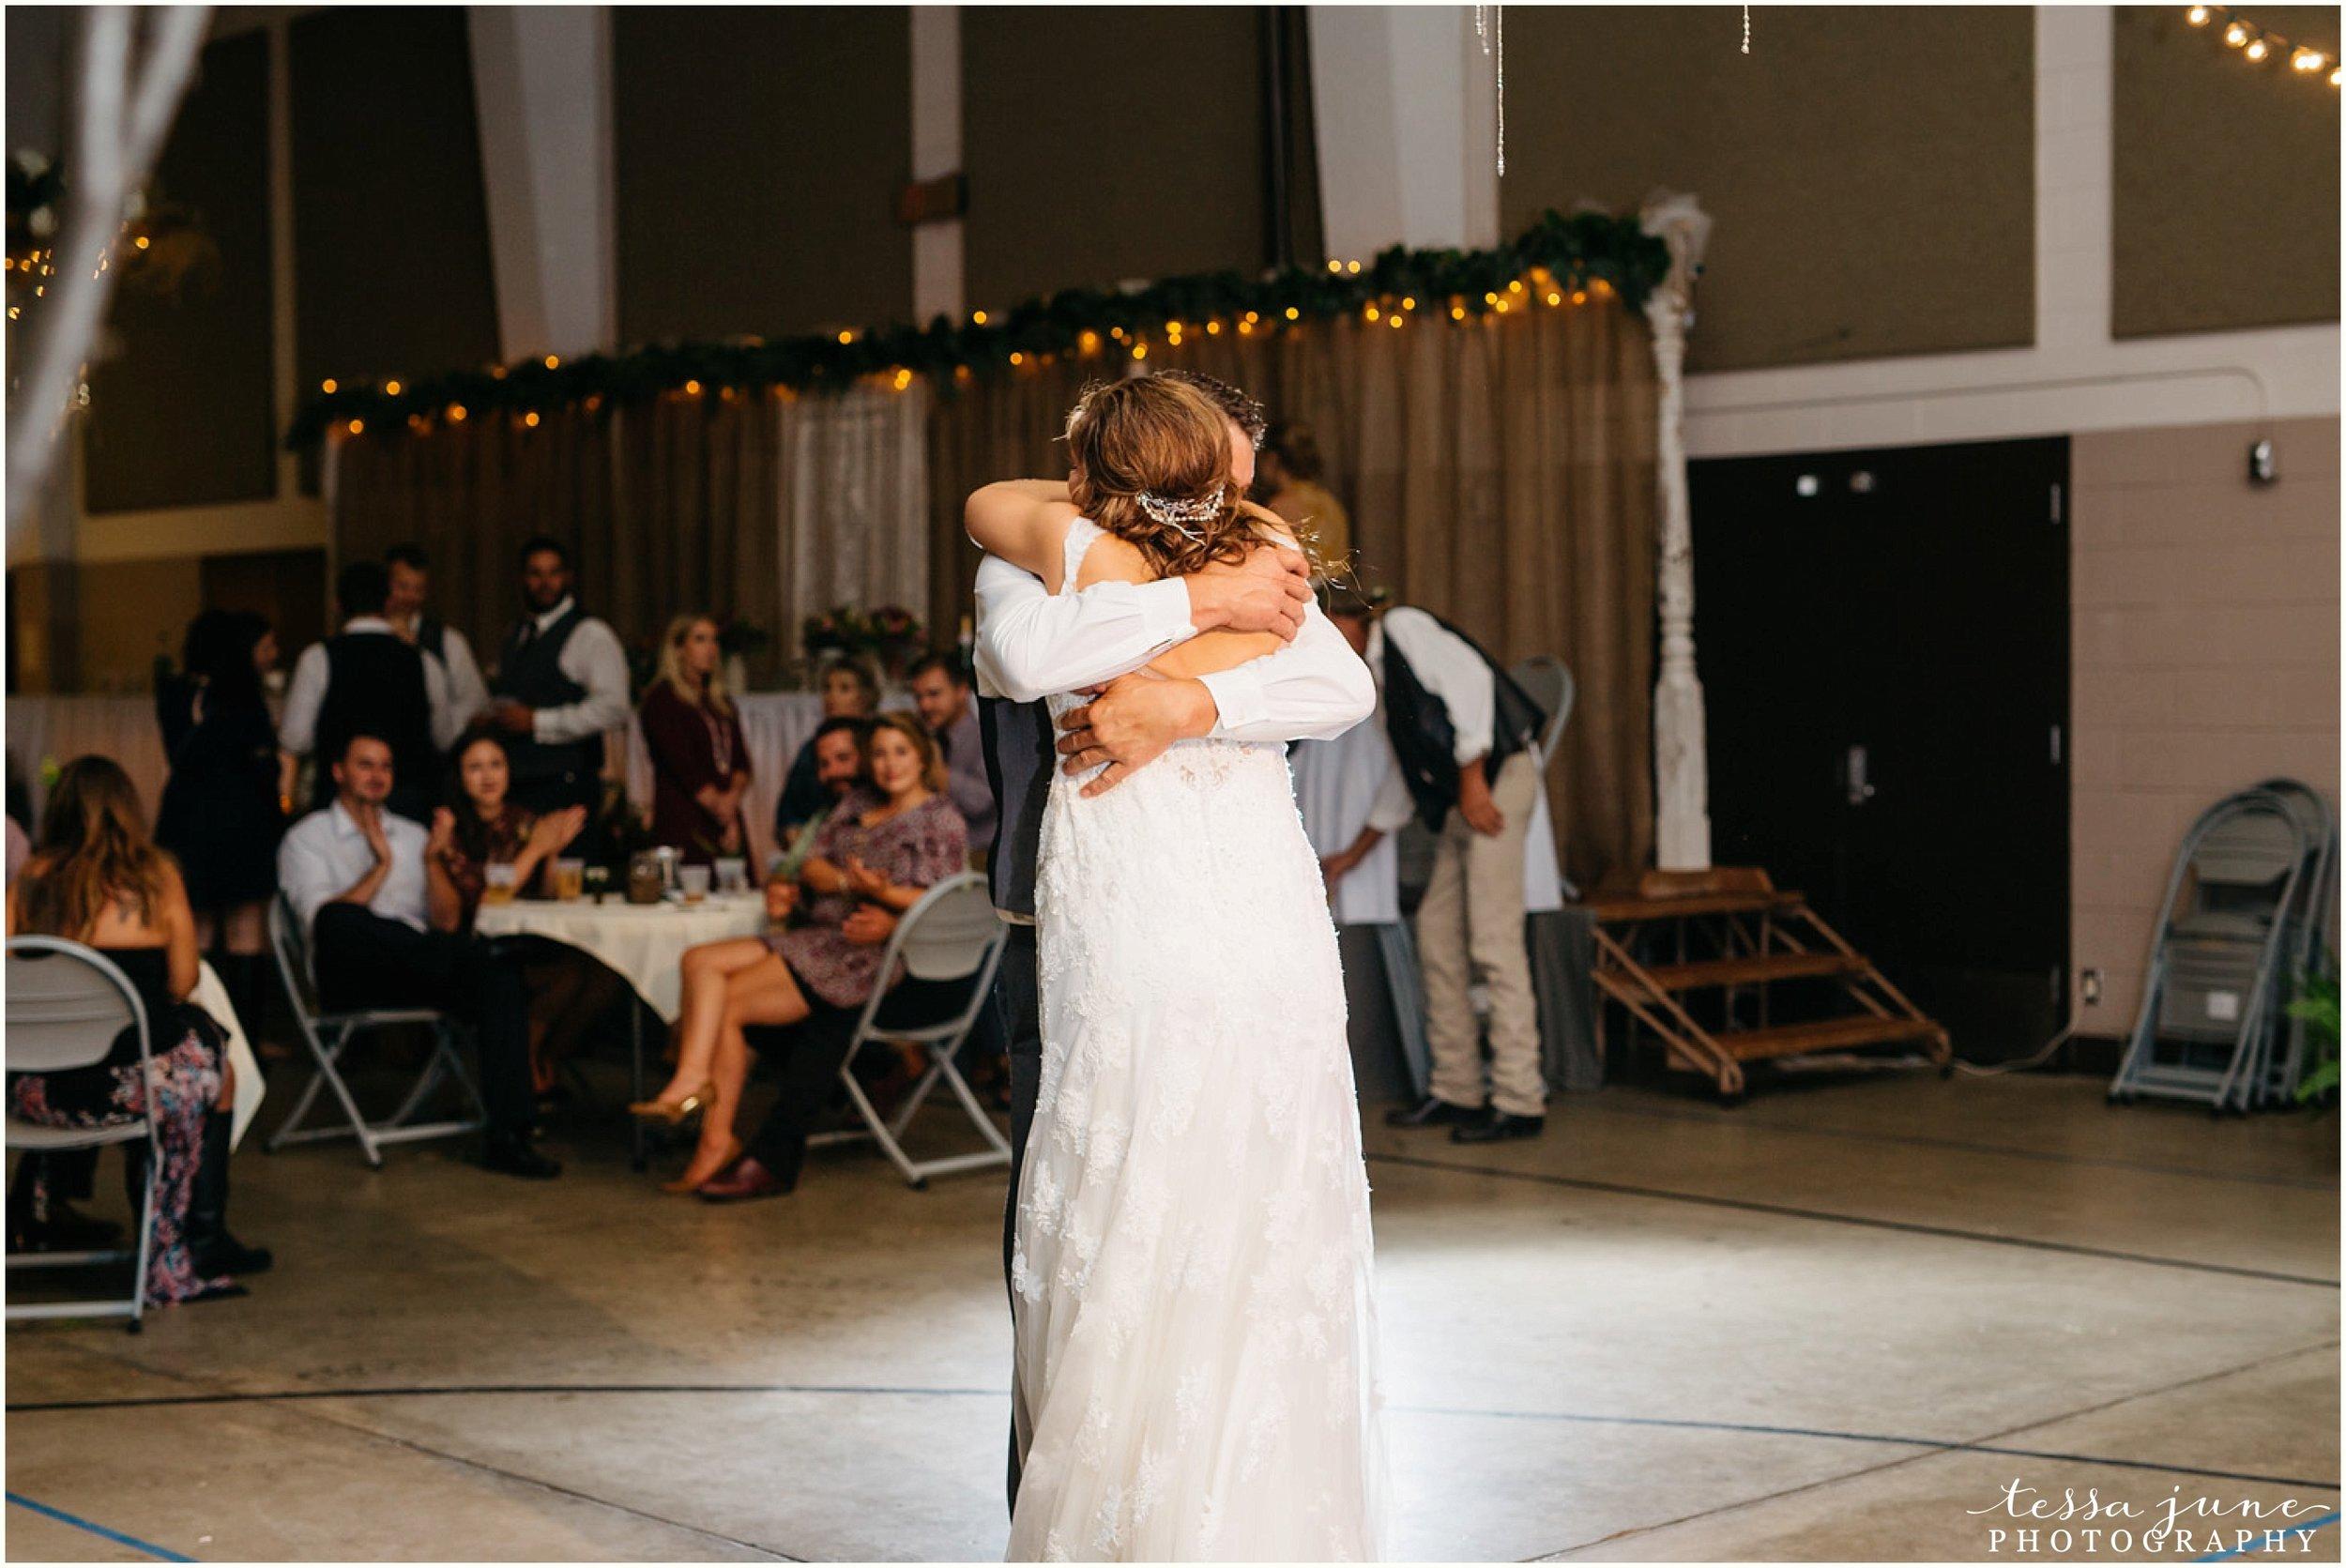 bohemian-minnesota-wedding-mismatched-bridesmaid-dresses-waterfall-st-cloud-tessa-june-photography-194.jpg